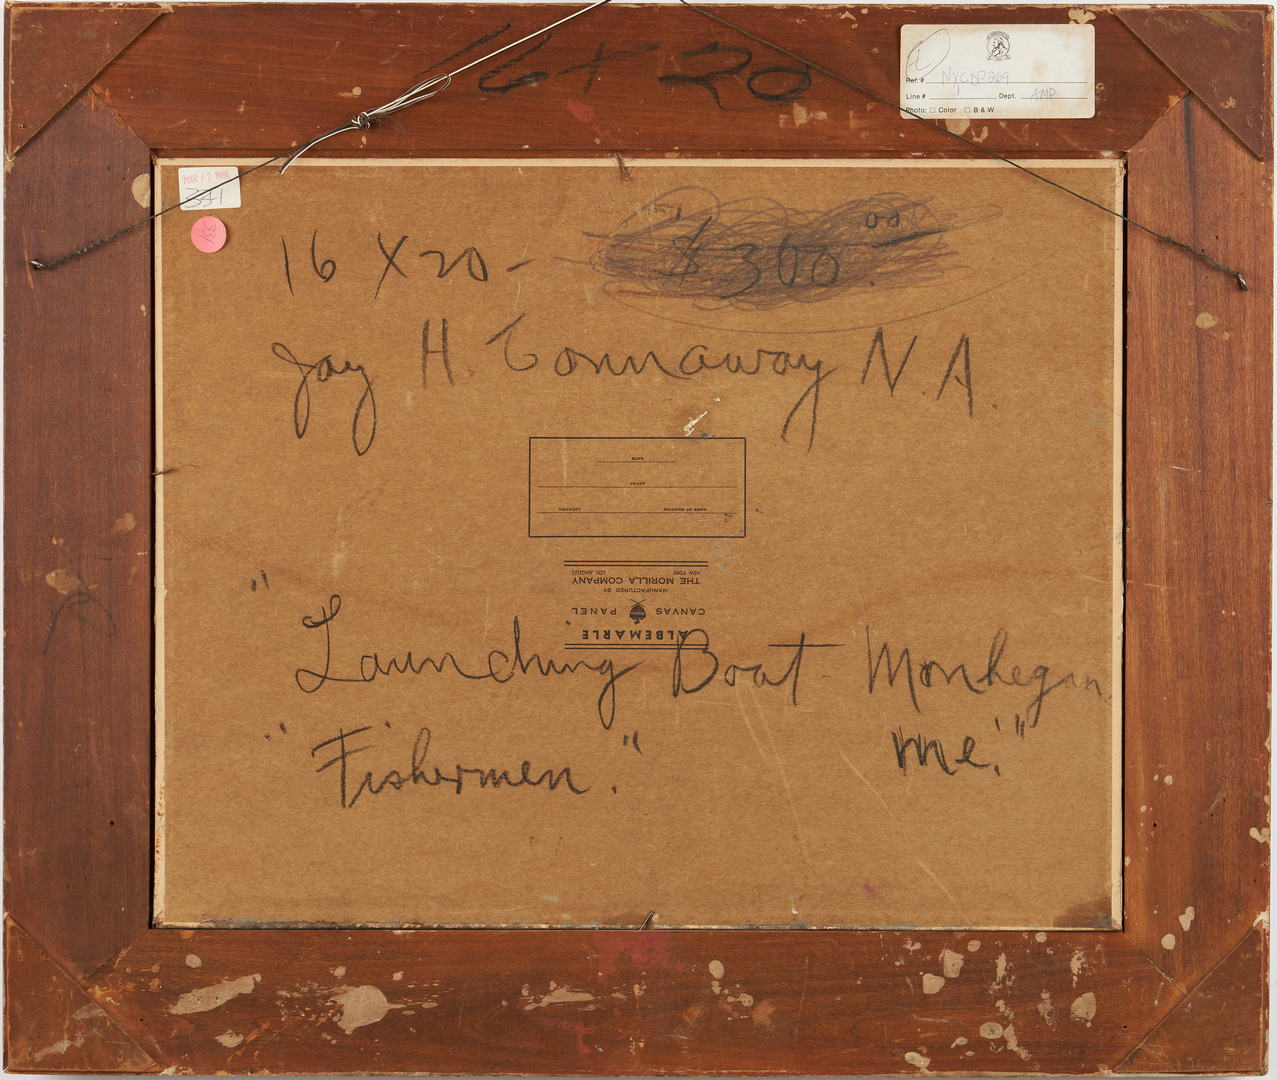 Lot 116: Jay H. Connaway O/B, Launching Boat, Monhegan, ME